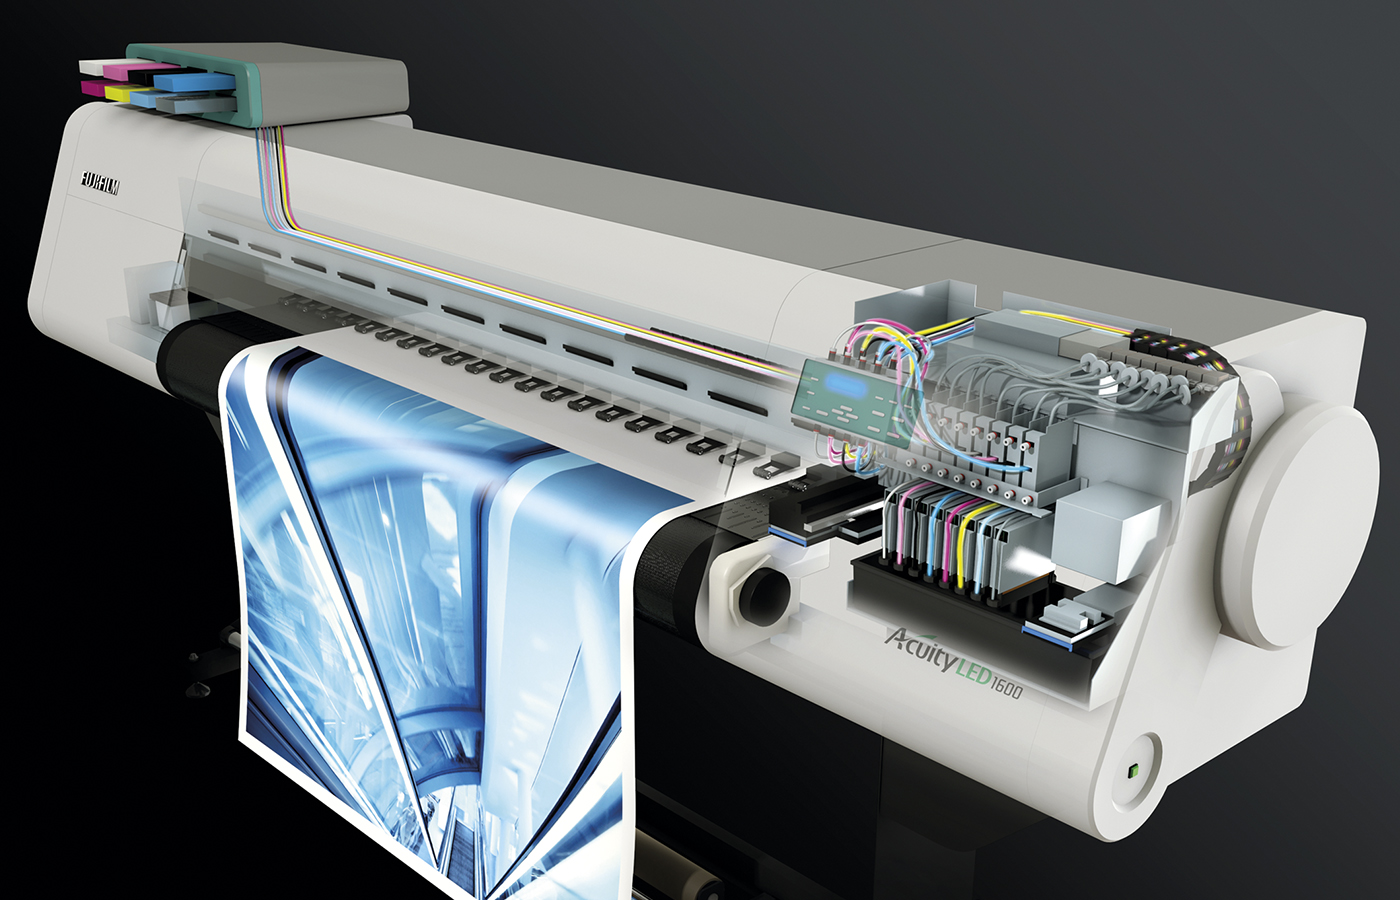 Acuity-LED-1600-Fujifilm-technology